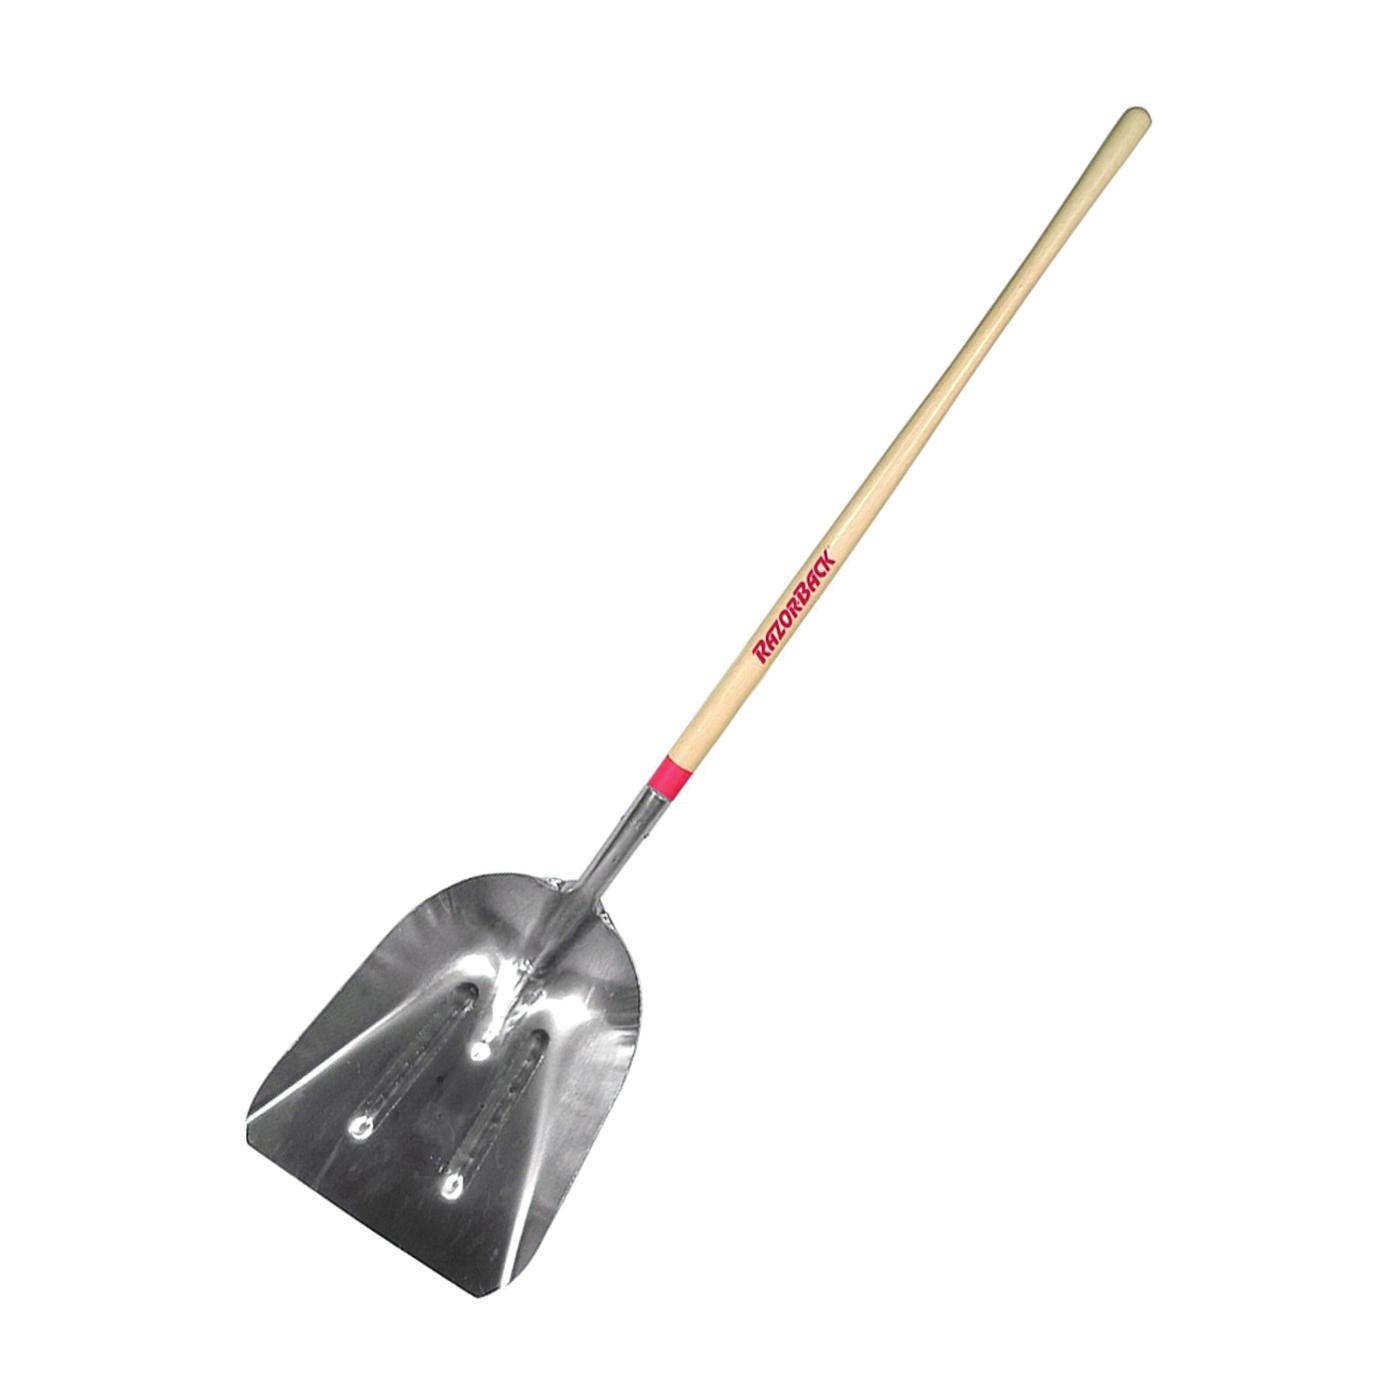 Picture of RAZOR-BACK 53127 Scoop Shovel, 14-1/4 in W Blade, 18 in L Blade, Aluminum Blade, Wood Handle, Long Handle